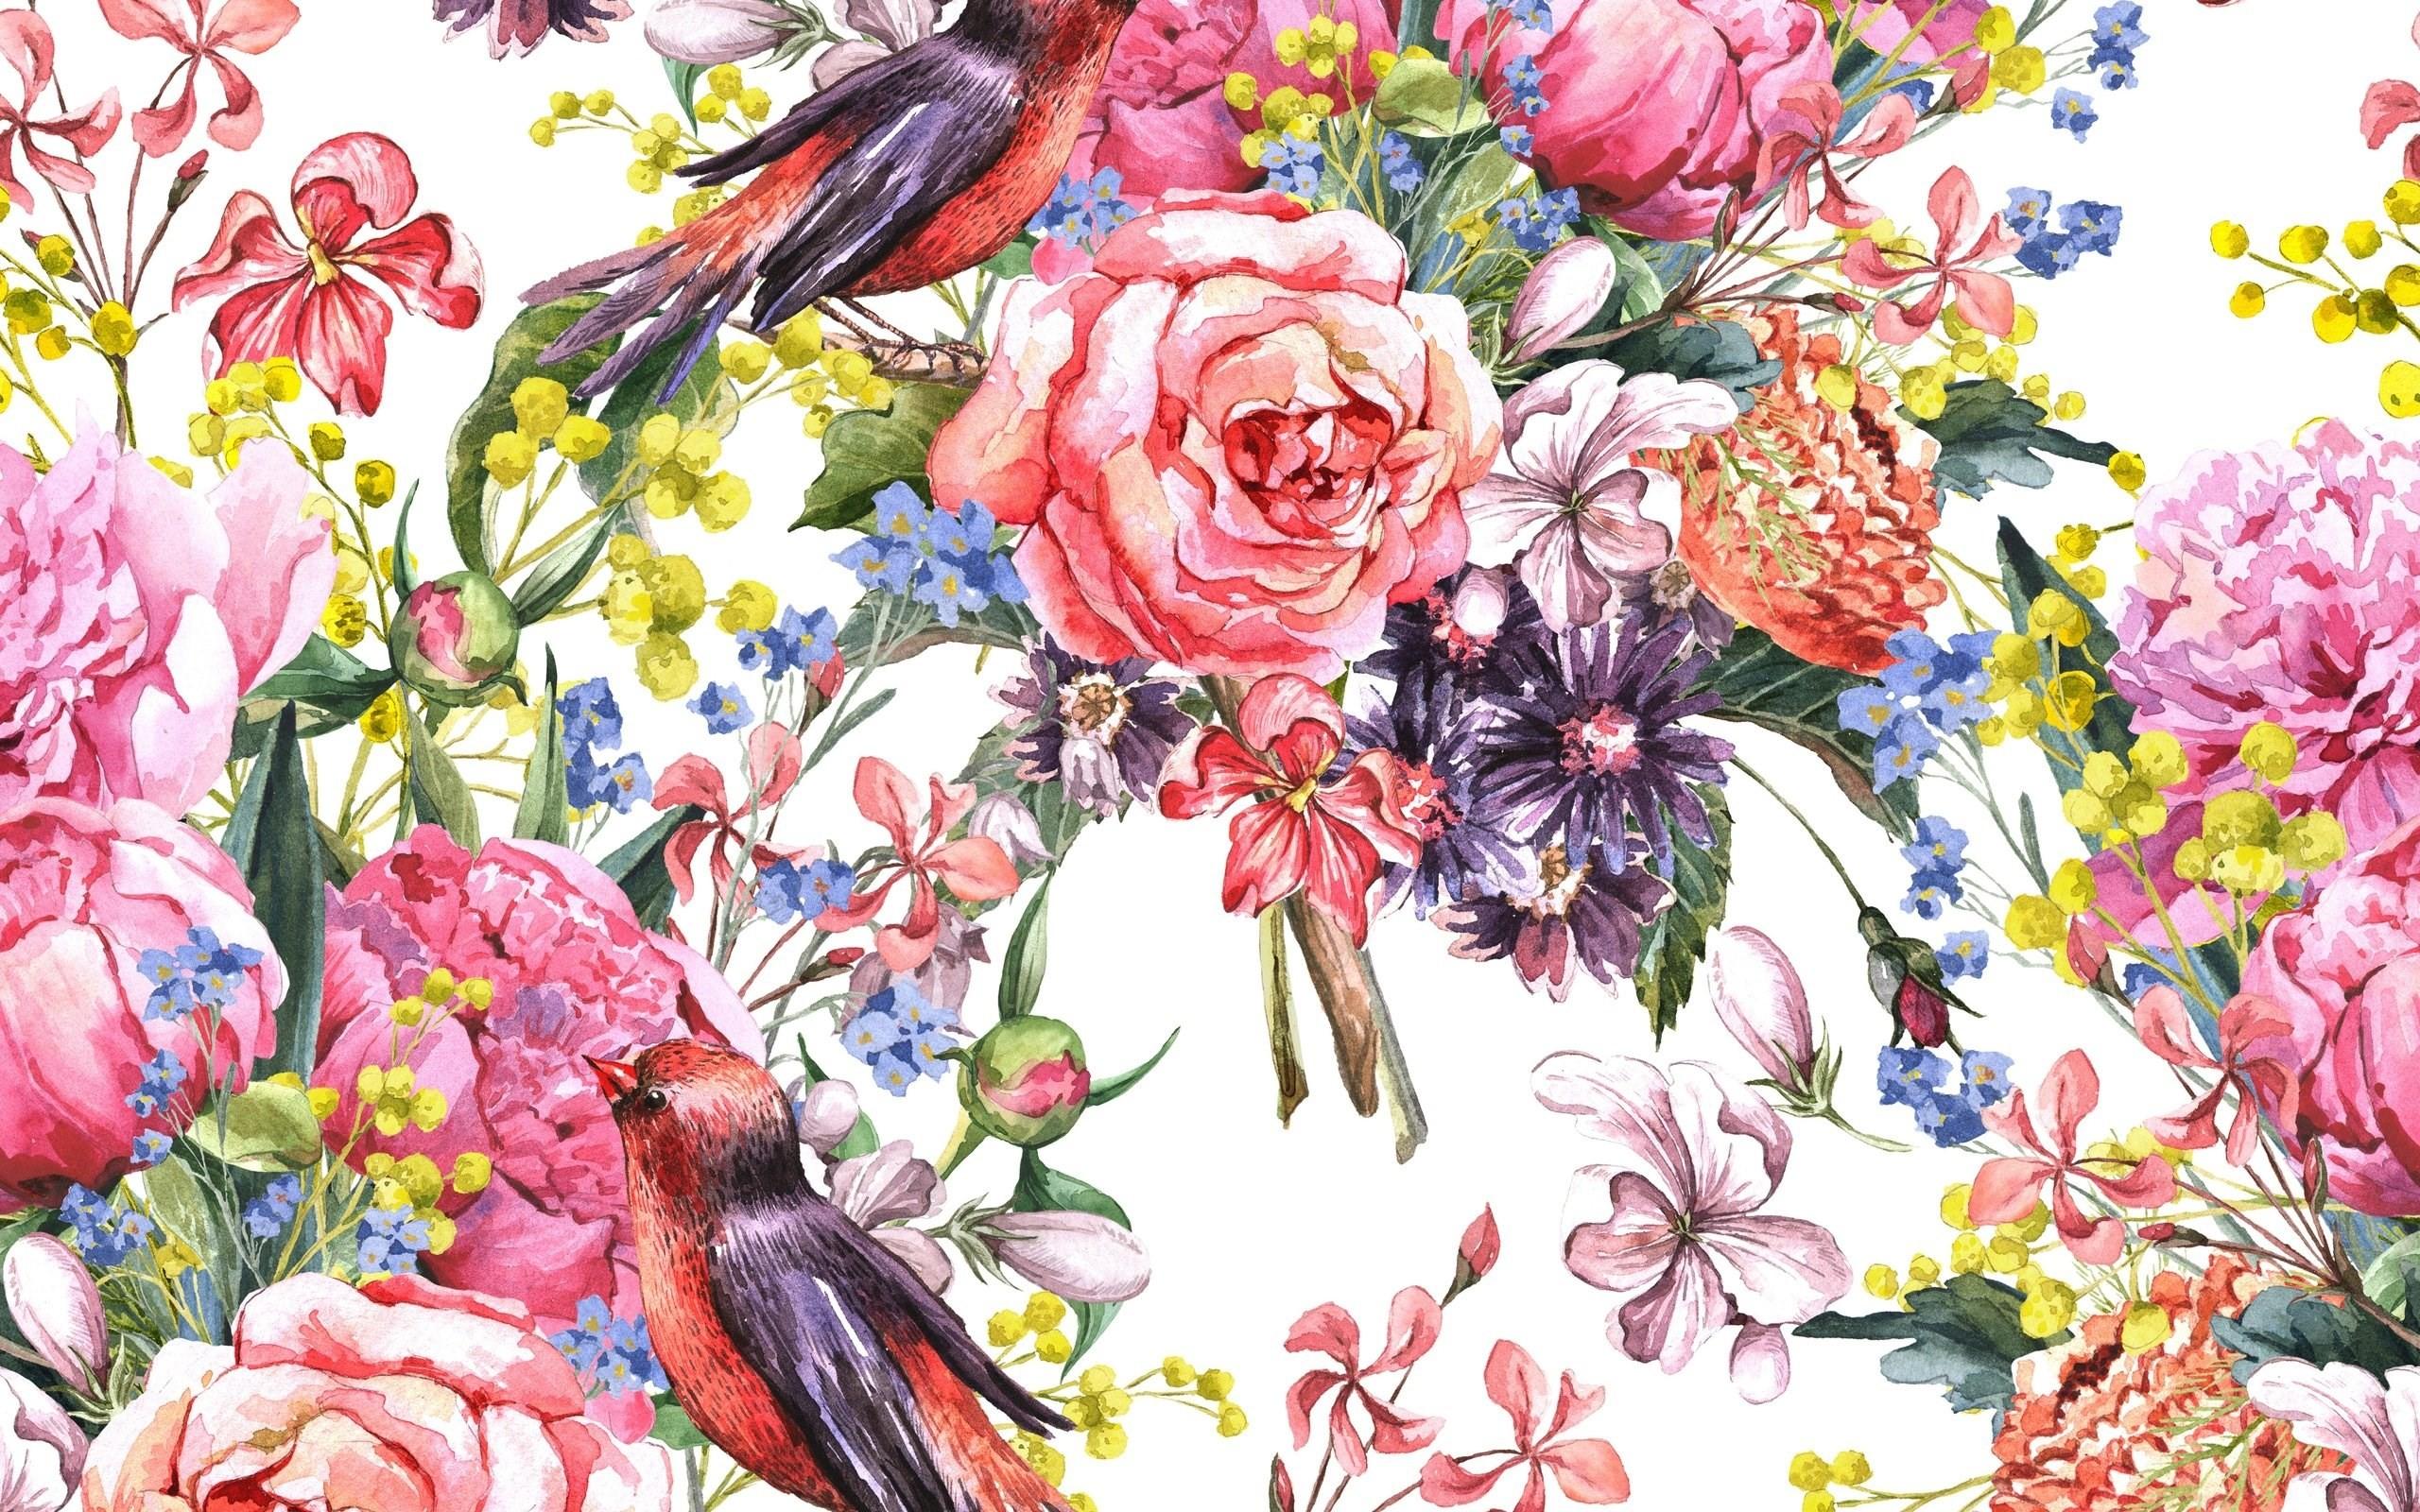 painting watercolor flowers birds